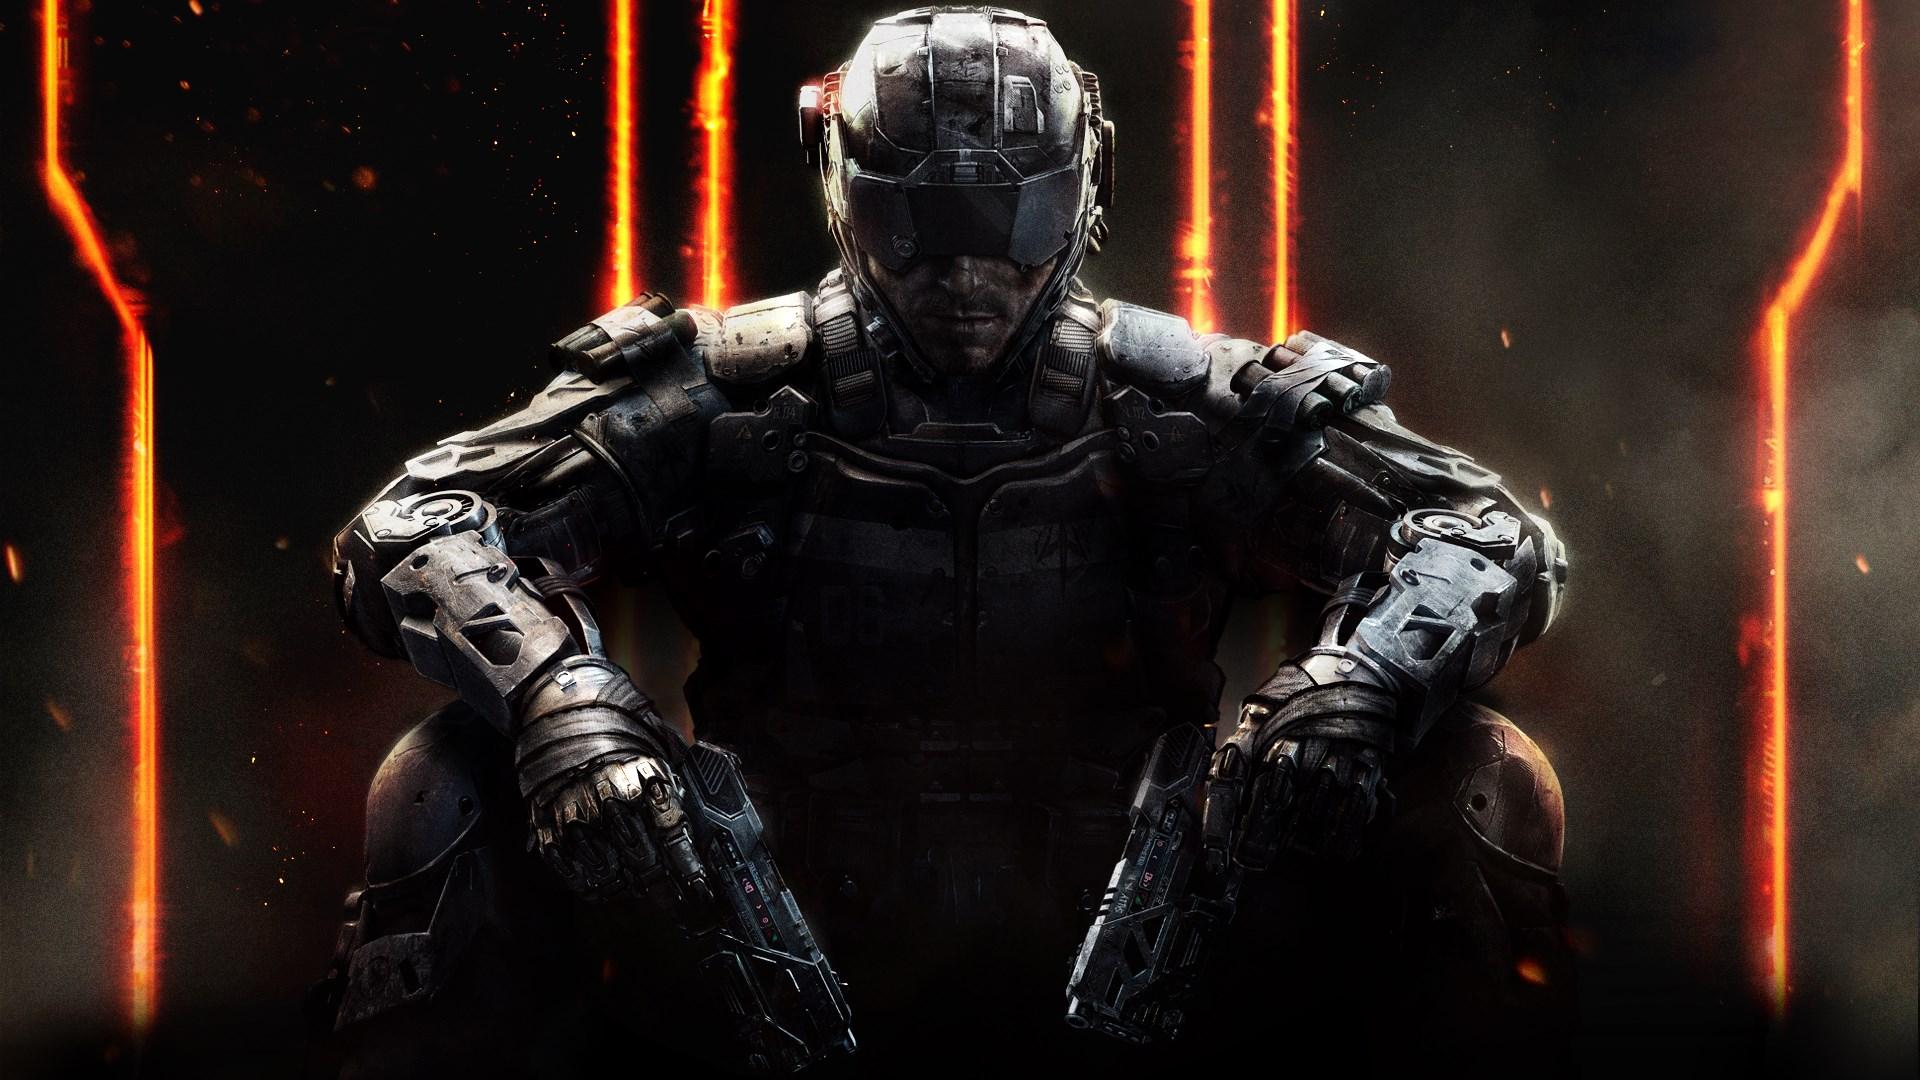 Buy Call of Duty: Black Ops III - Microsoft Store